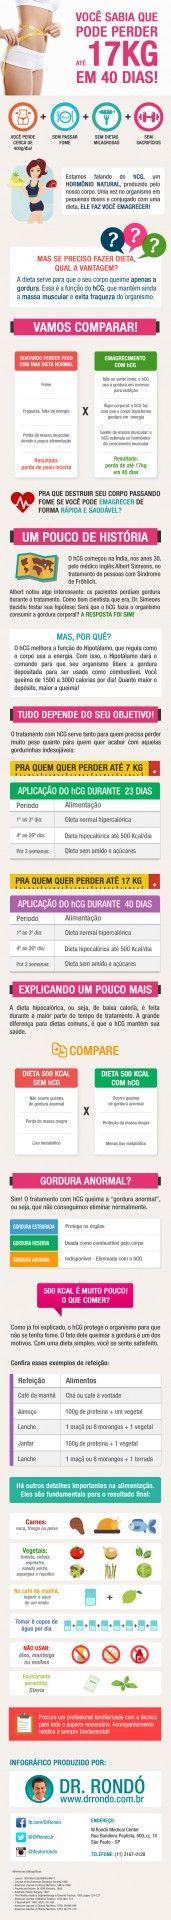 infografico-hcg-dr-rondo1.jpg 171×1.920 pixels